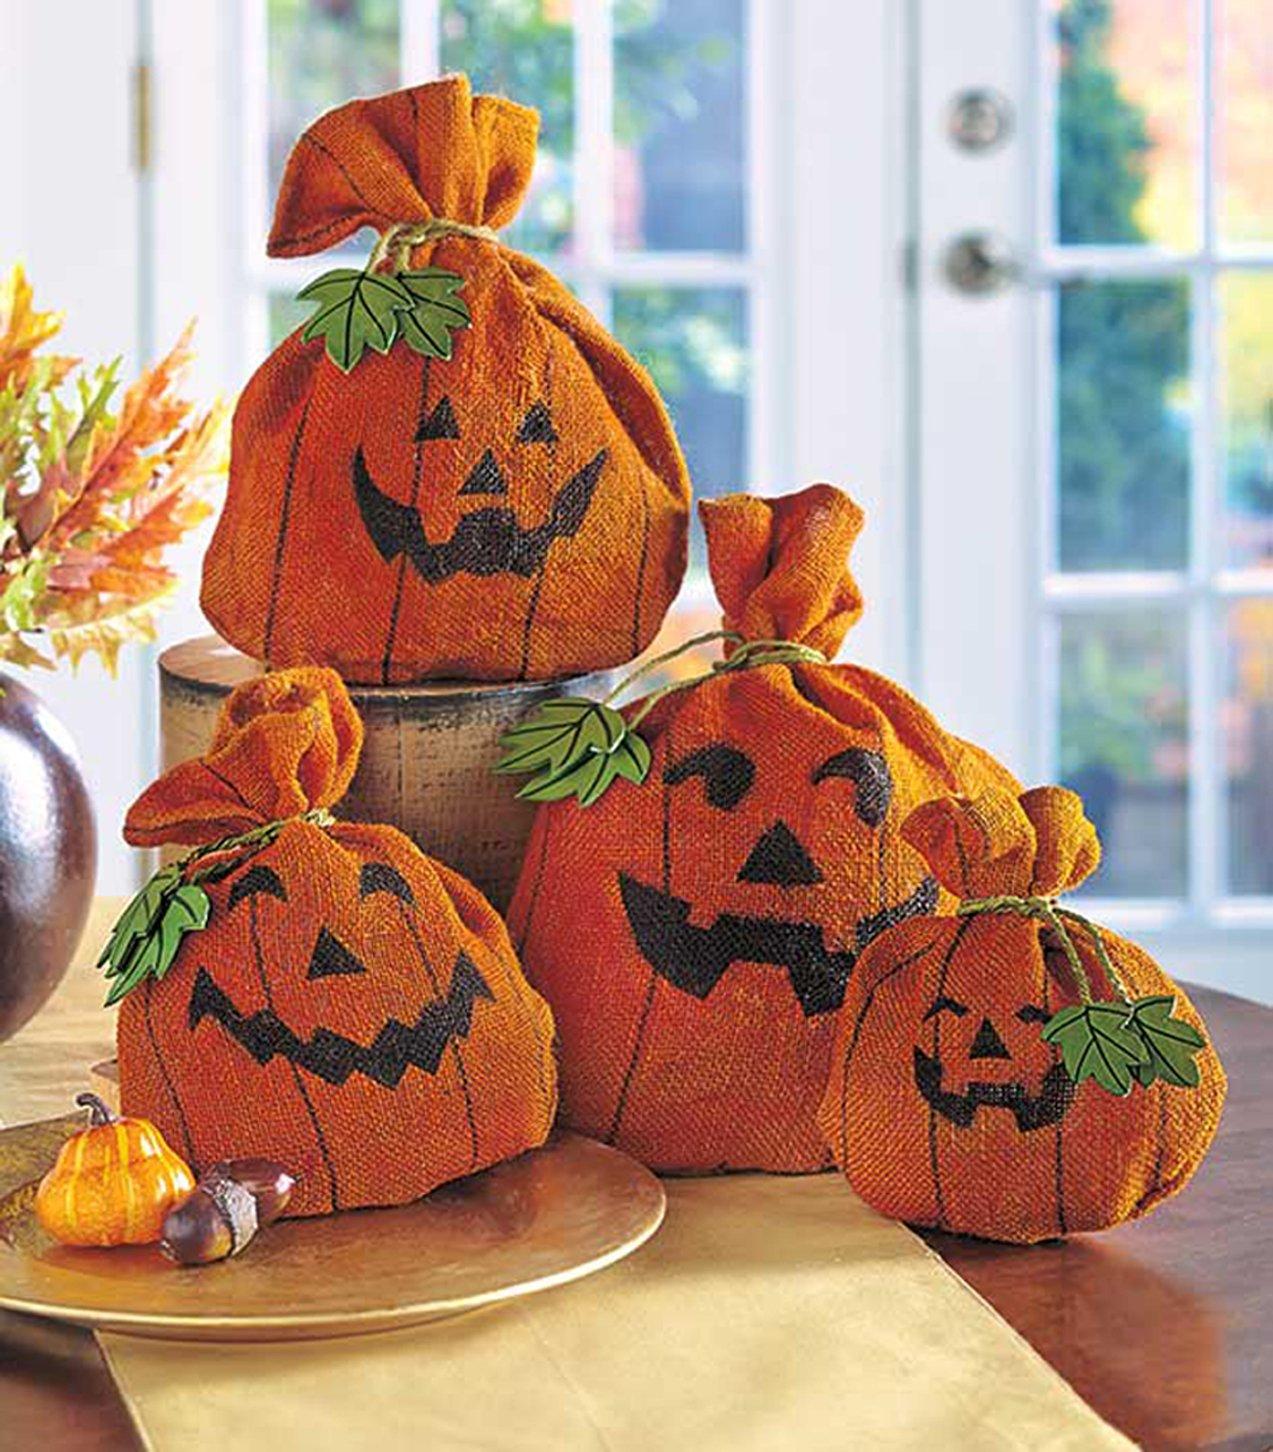 amazon com burlap pumpkin set of 4 halloween decor decorative amazon com burlap pumpkin set of 4 halloween decor decorative burlap sacks home kitchen